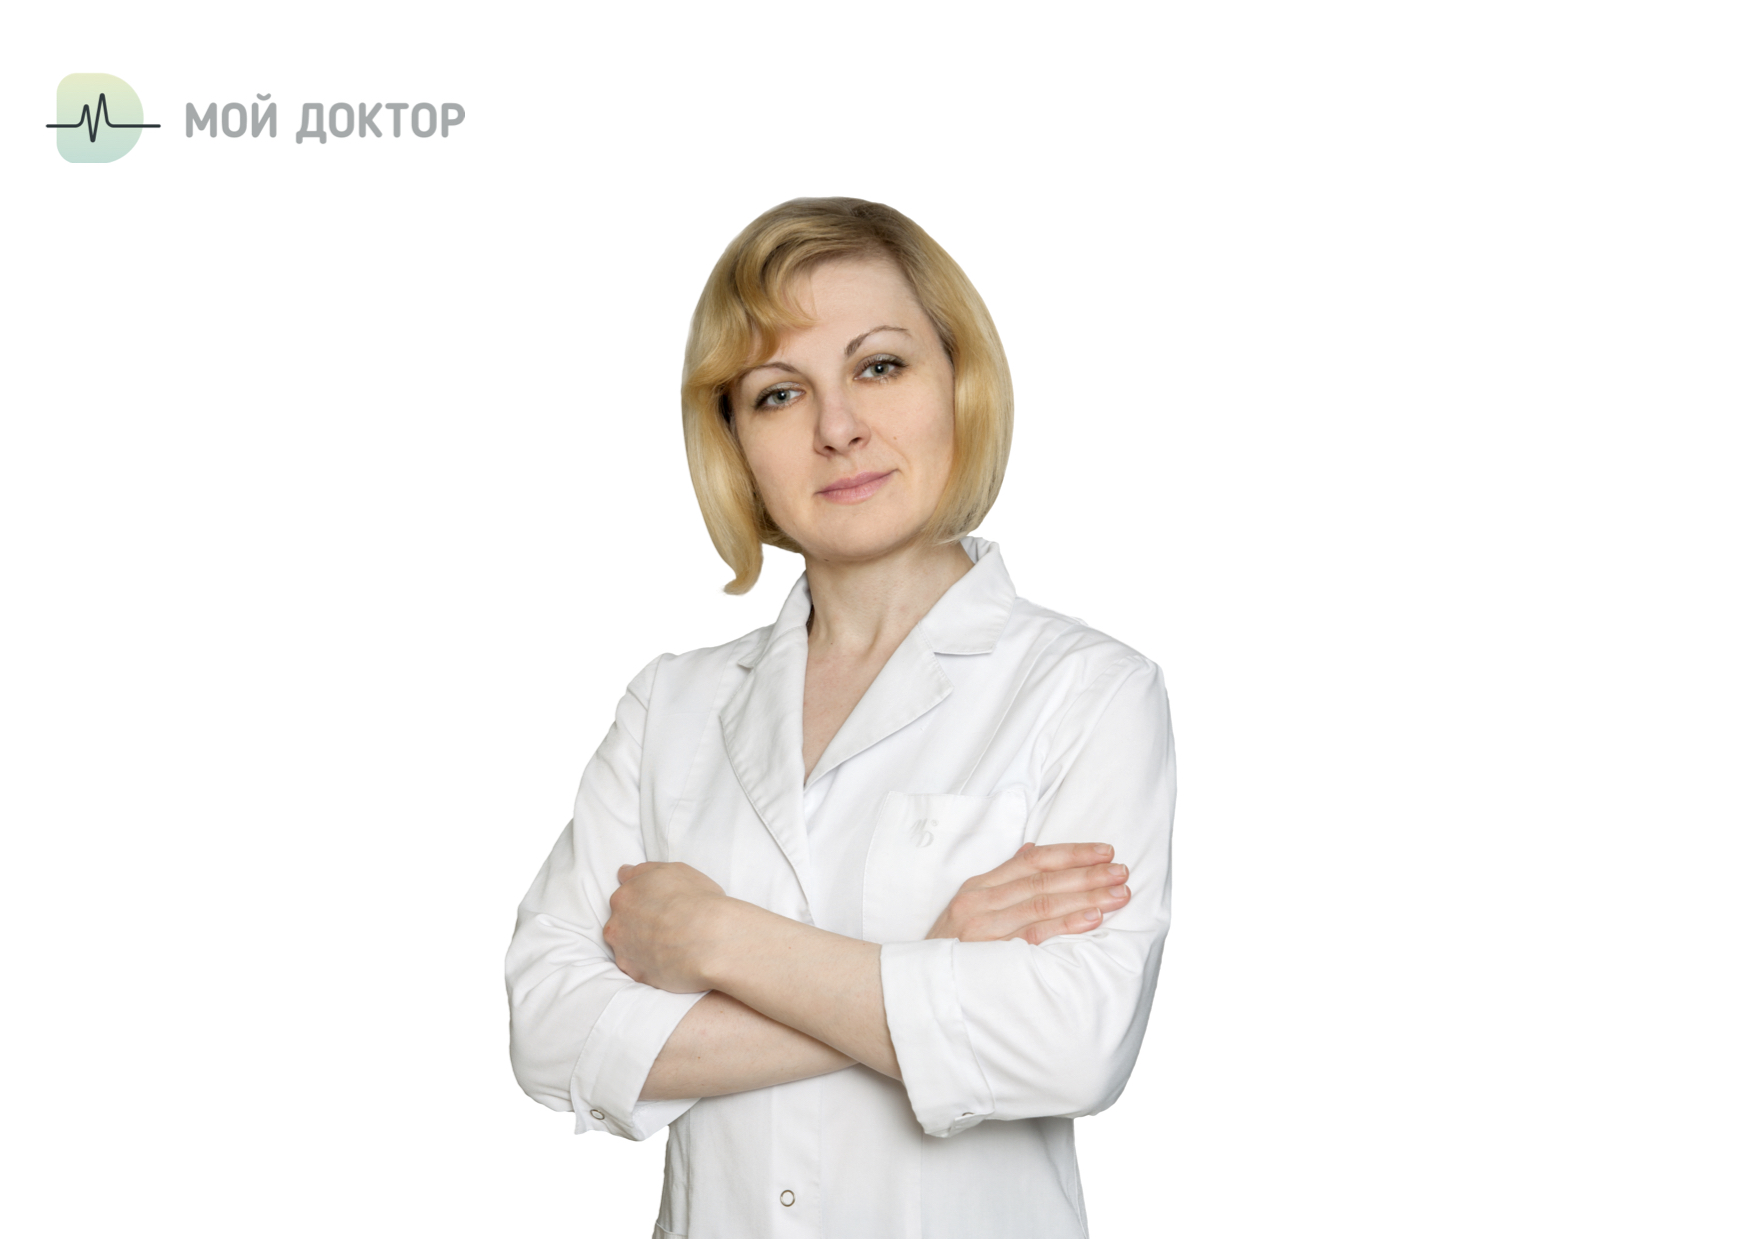 Педиатр Олеся Александровна Кирина - Батин Блог